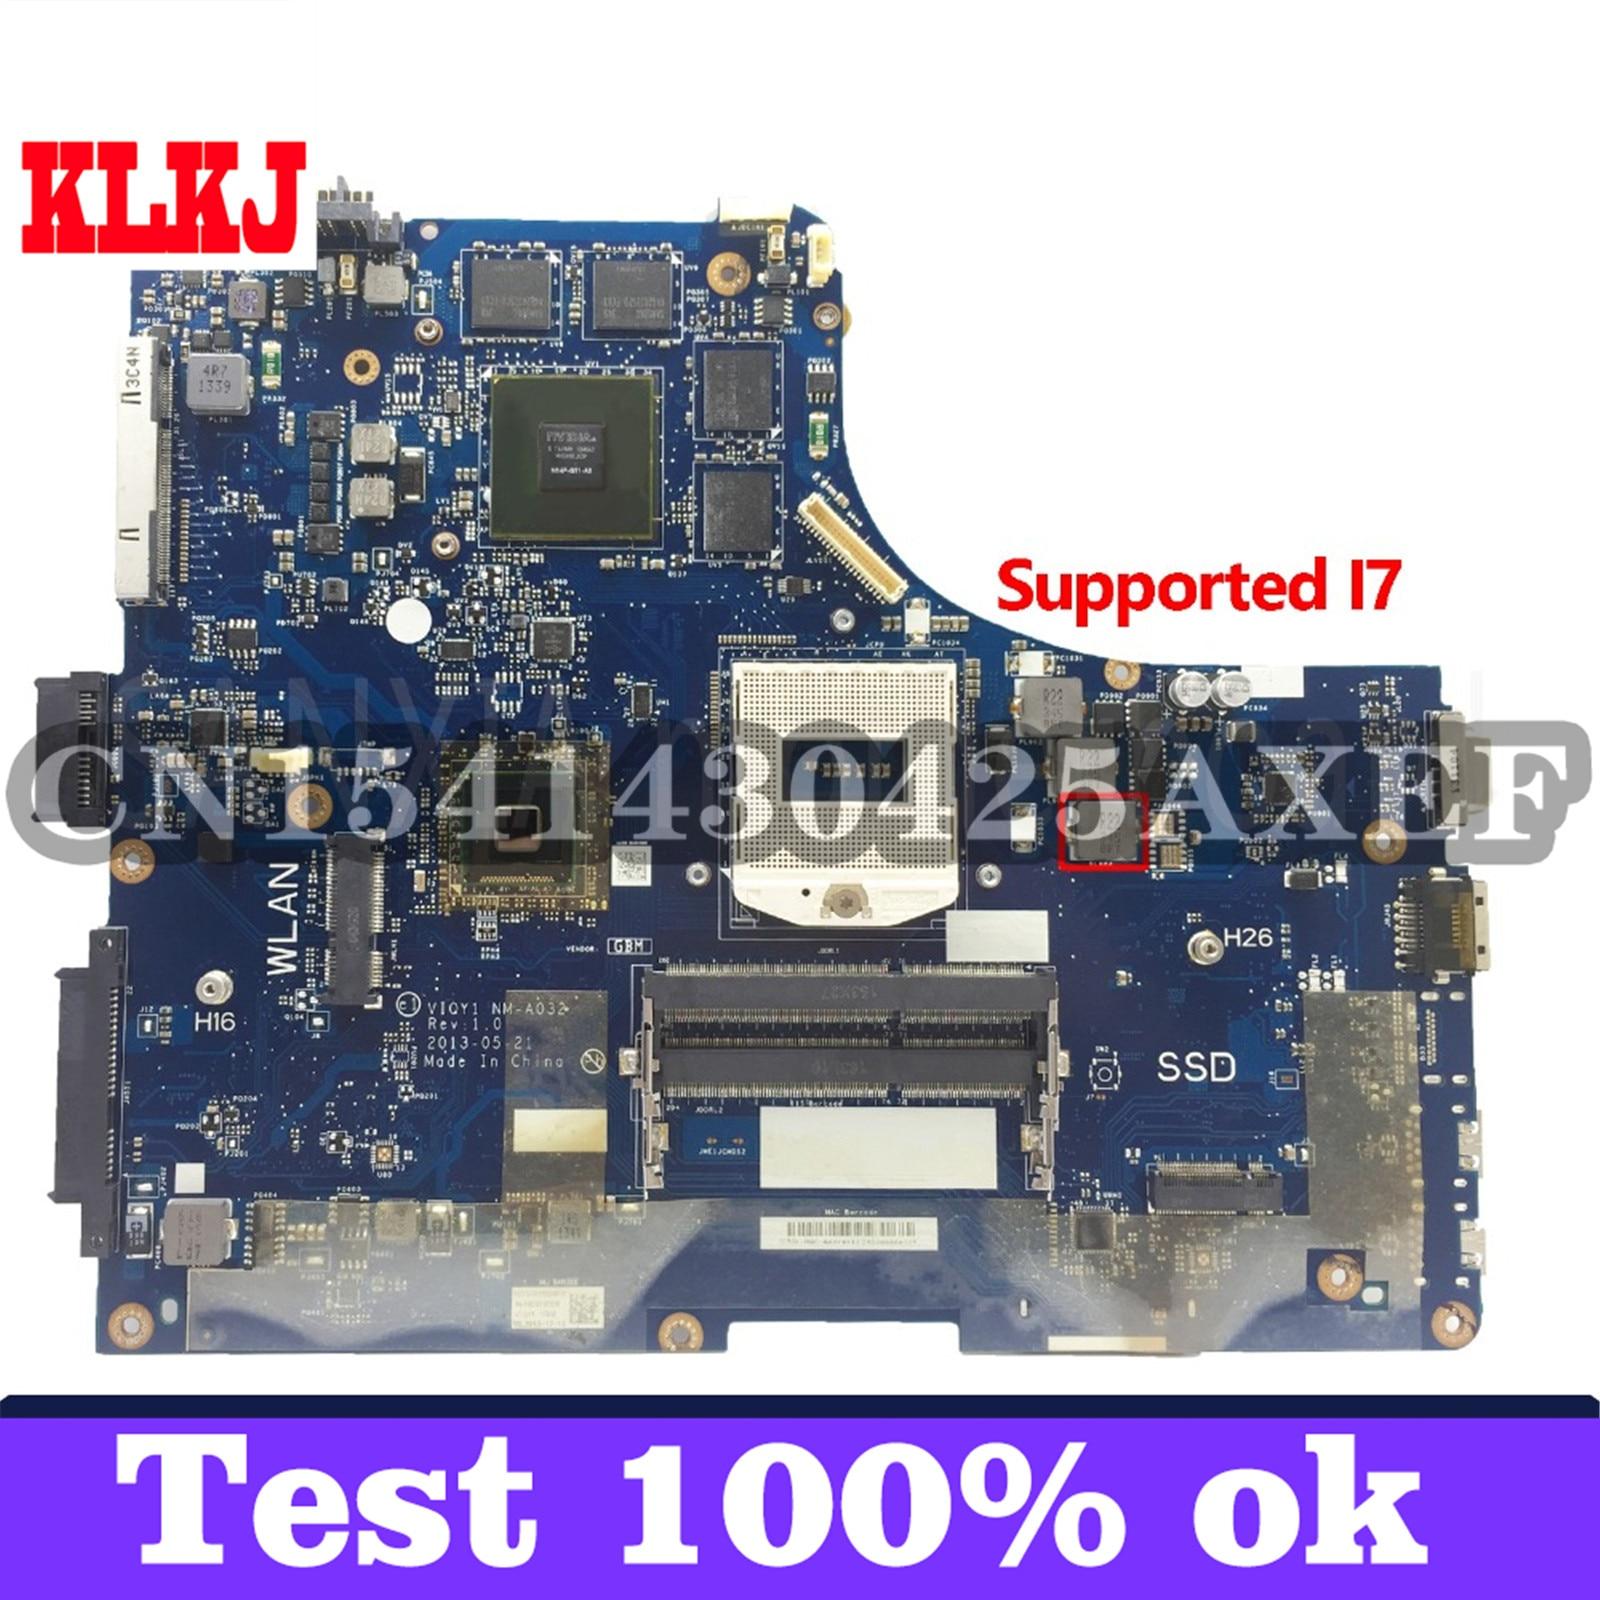 KLKJ NM-A032 اللوحة الرئيسية Laotop لينوفو Y510P 1920*1080 اللوحة الرئيسية الأصلية GT750M/GT755M دعم I7 وحدة المعالجة المركزية